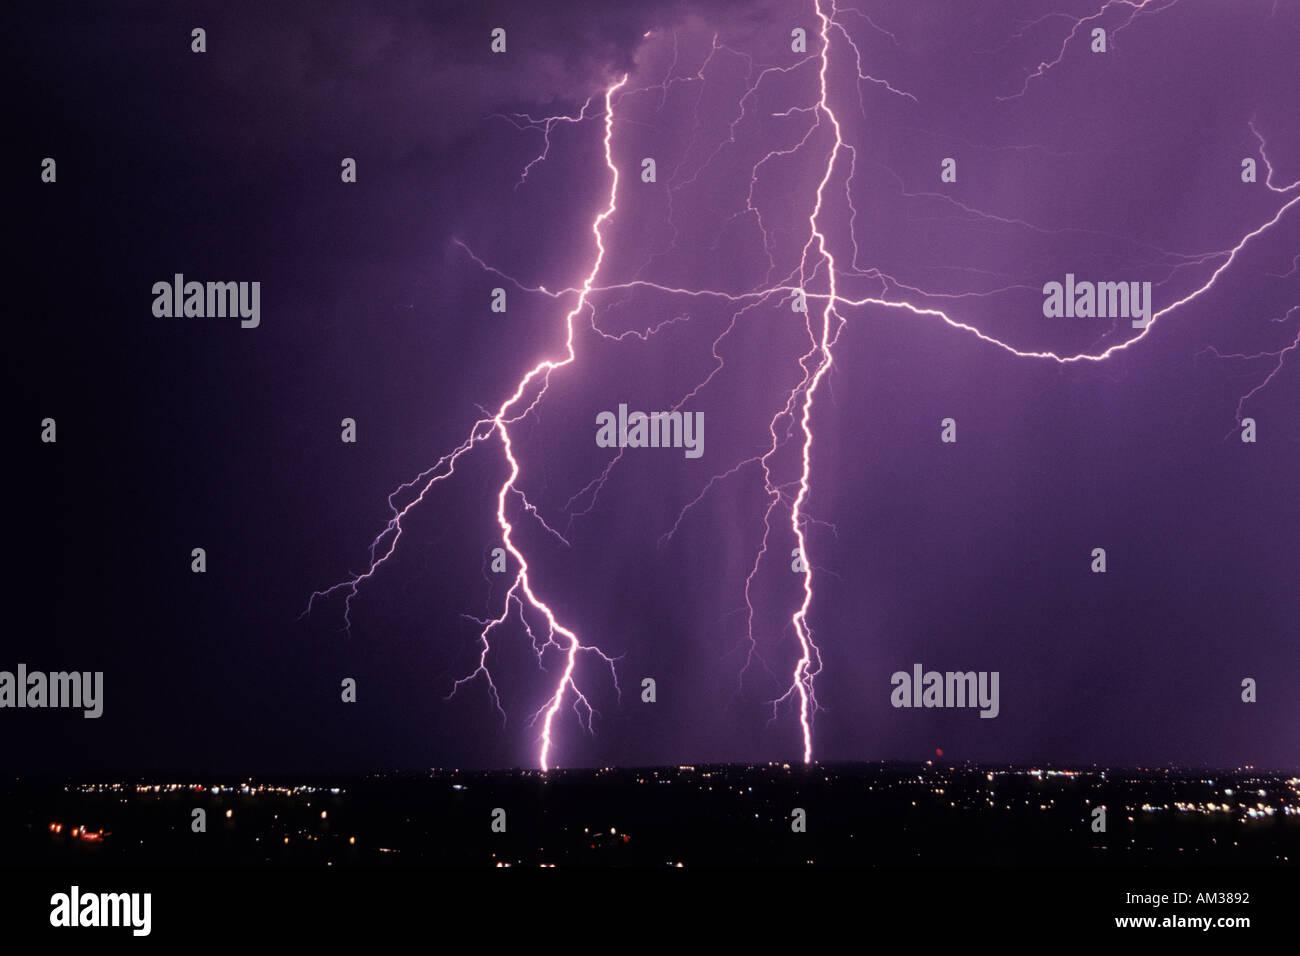 multiple lightning strikes over tucson arizona stock photo 1325201